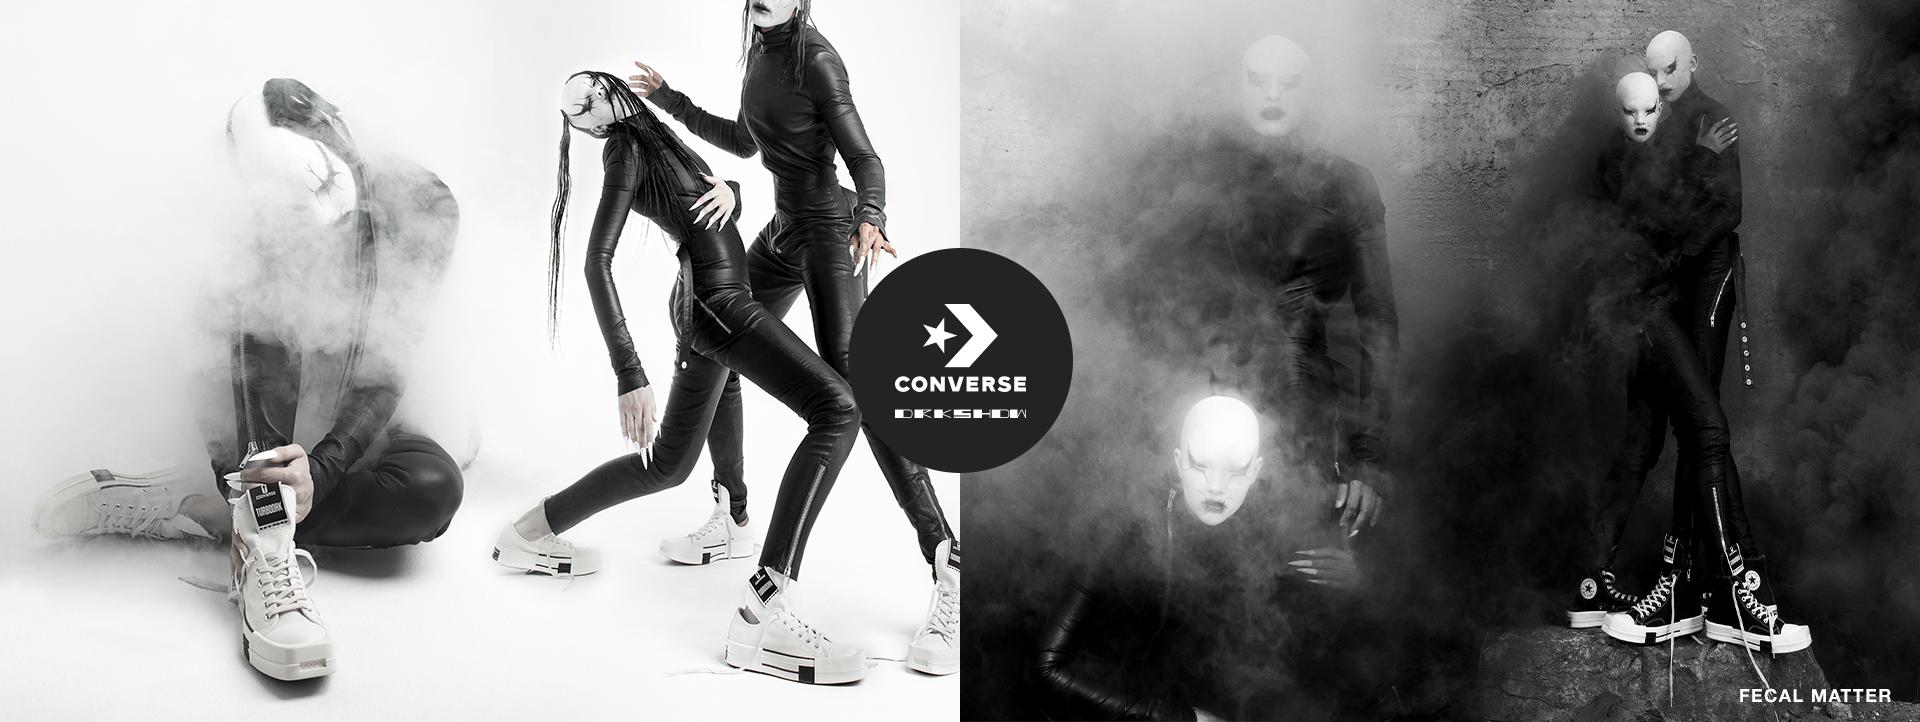 Converse x DRKSHDW